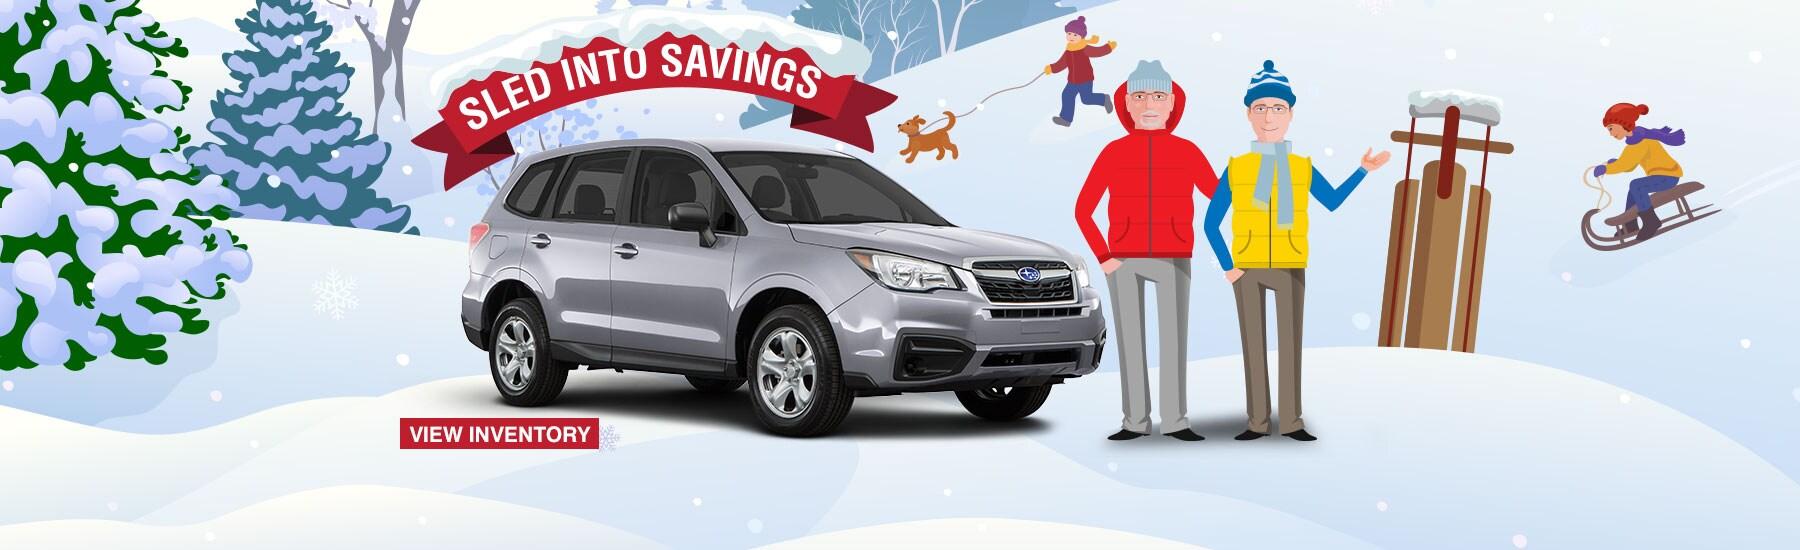 Car Dealerships In Champaign Il >> New Subaru & Used Car Dealer in Savoy, IL - Subaru of ...